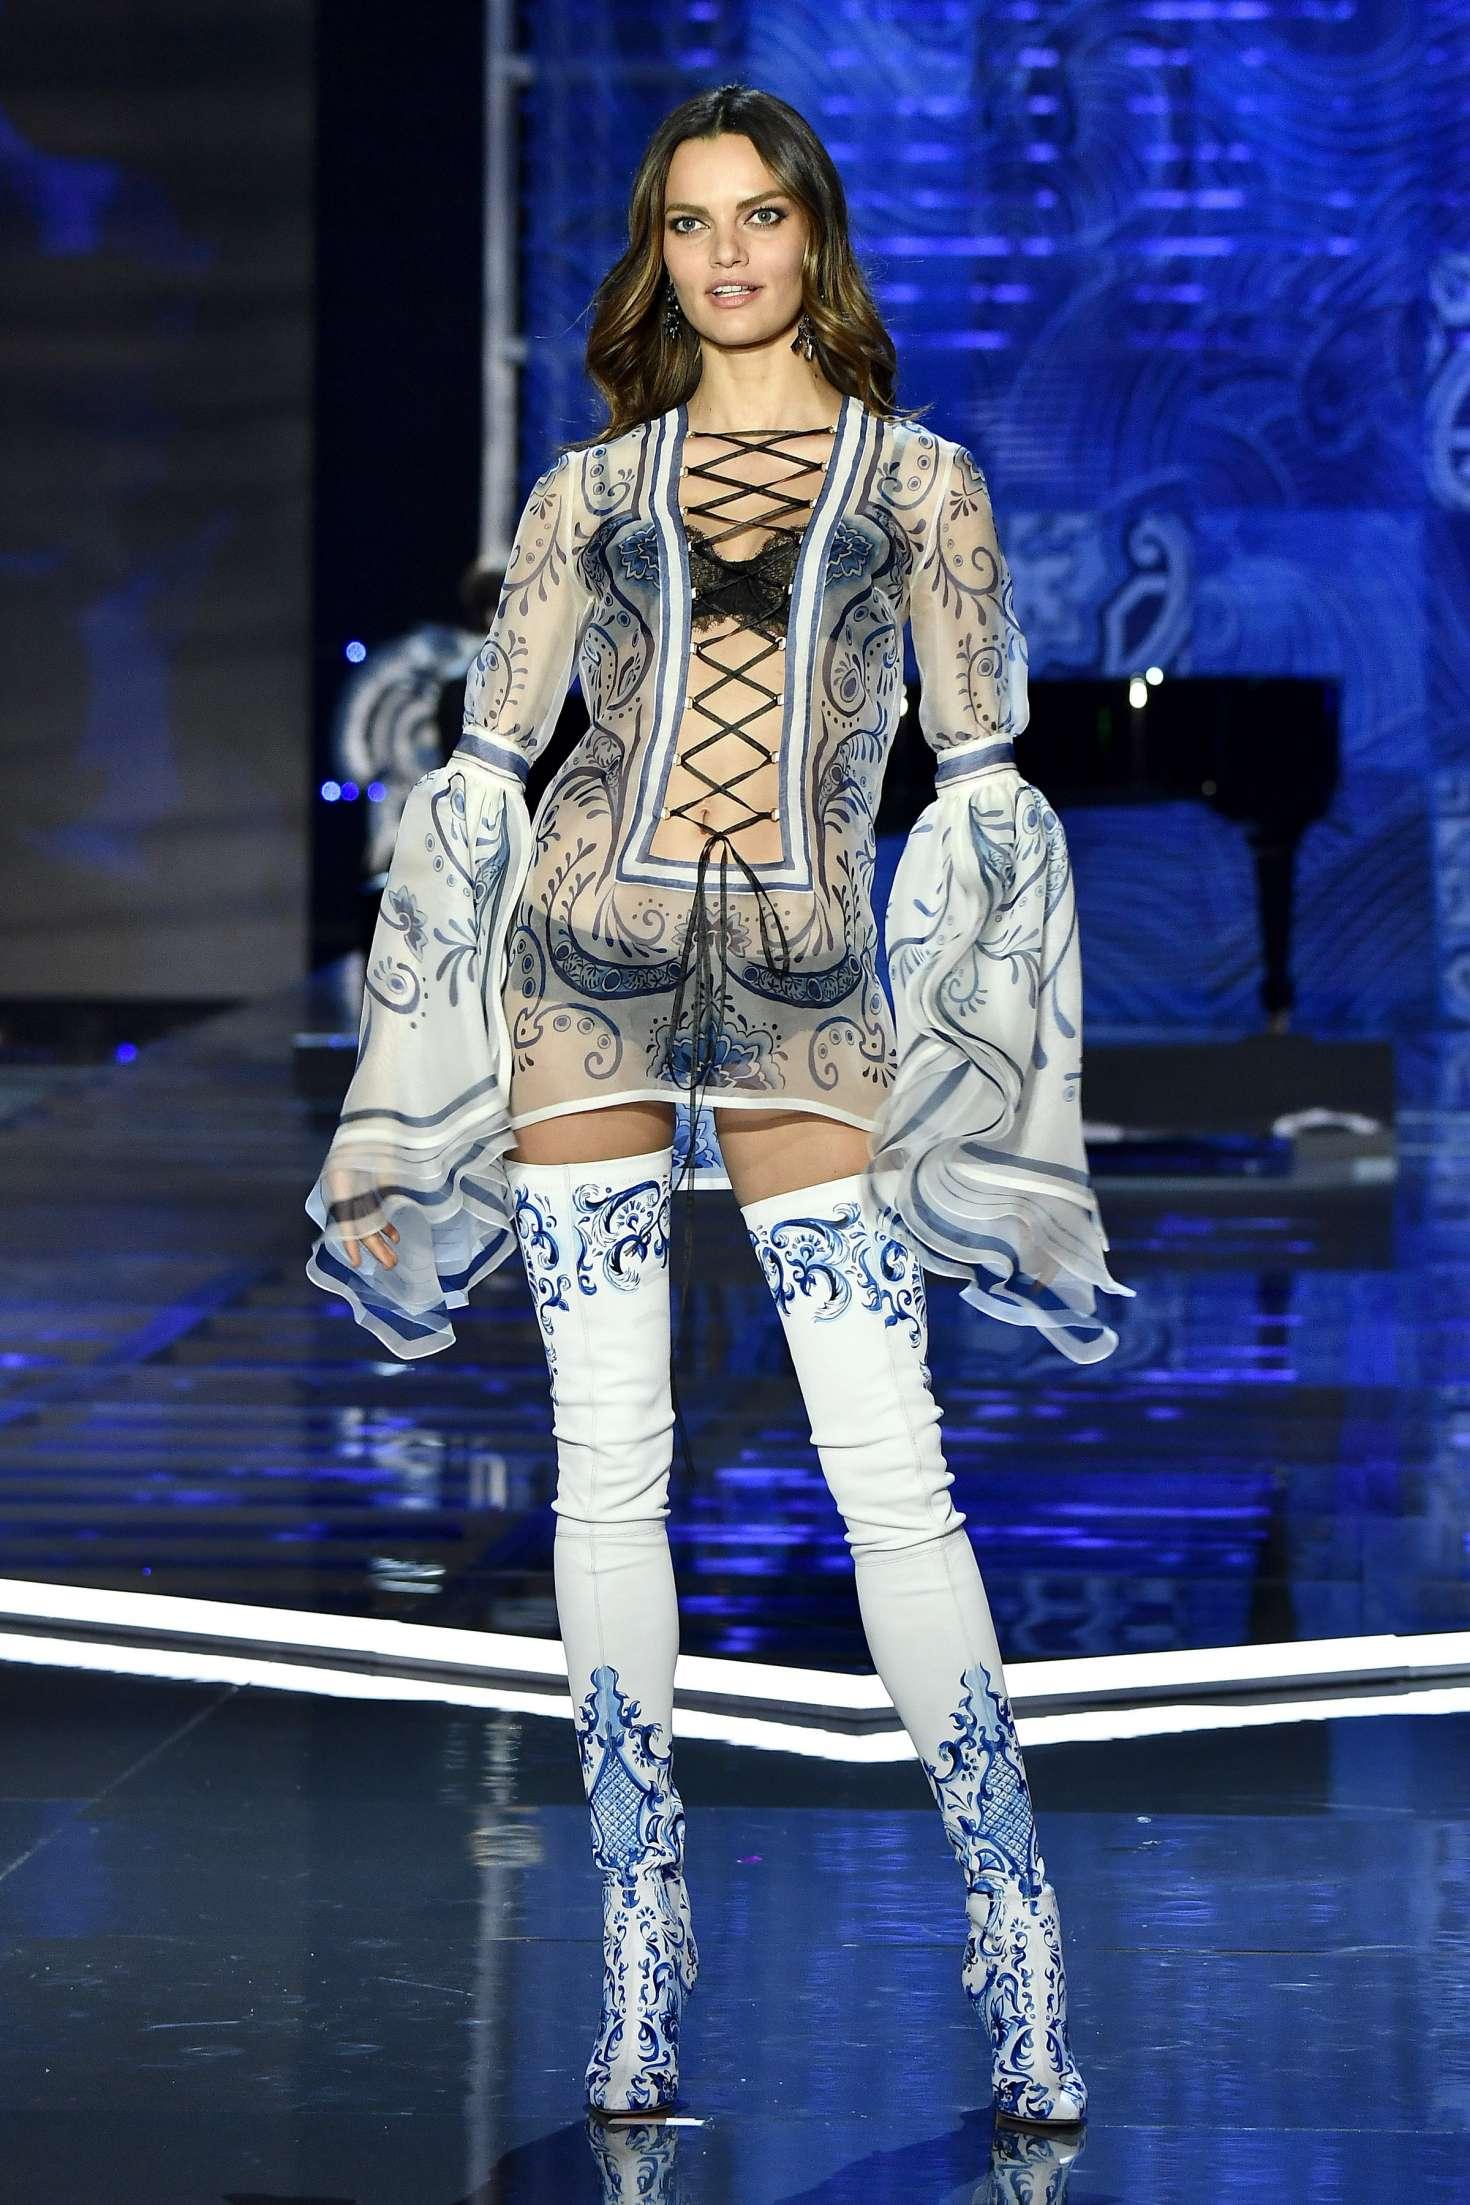 Barbara Fialho - 2017 Victoria's Secret Fashion Show Runway in Shanghai